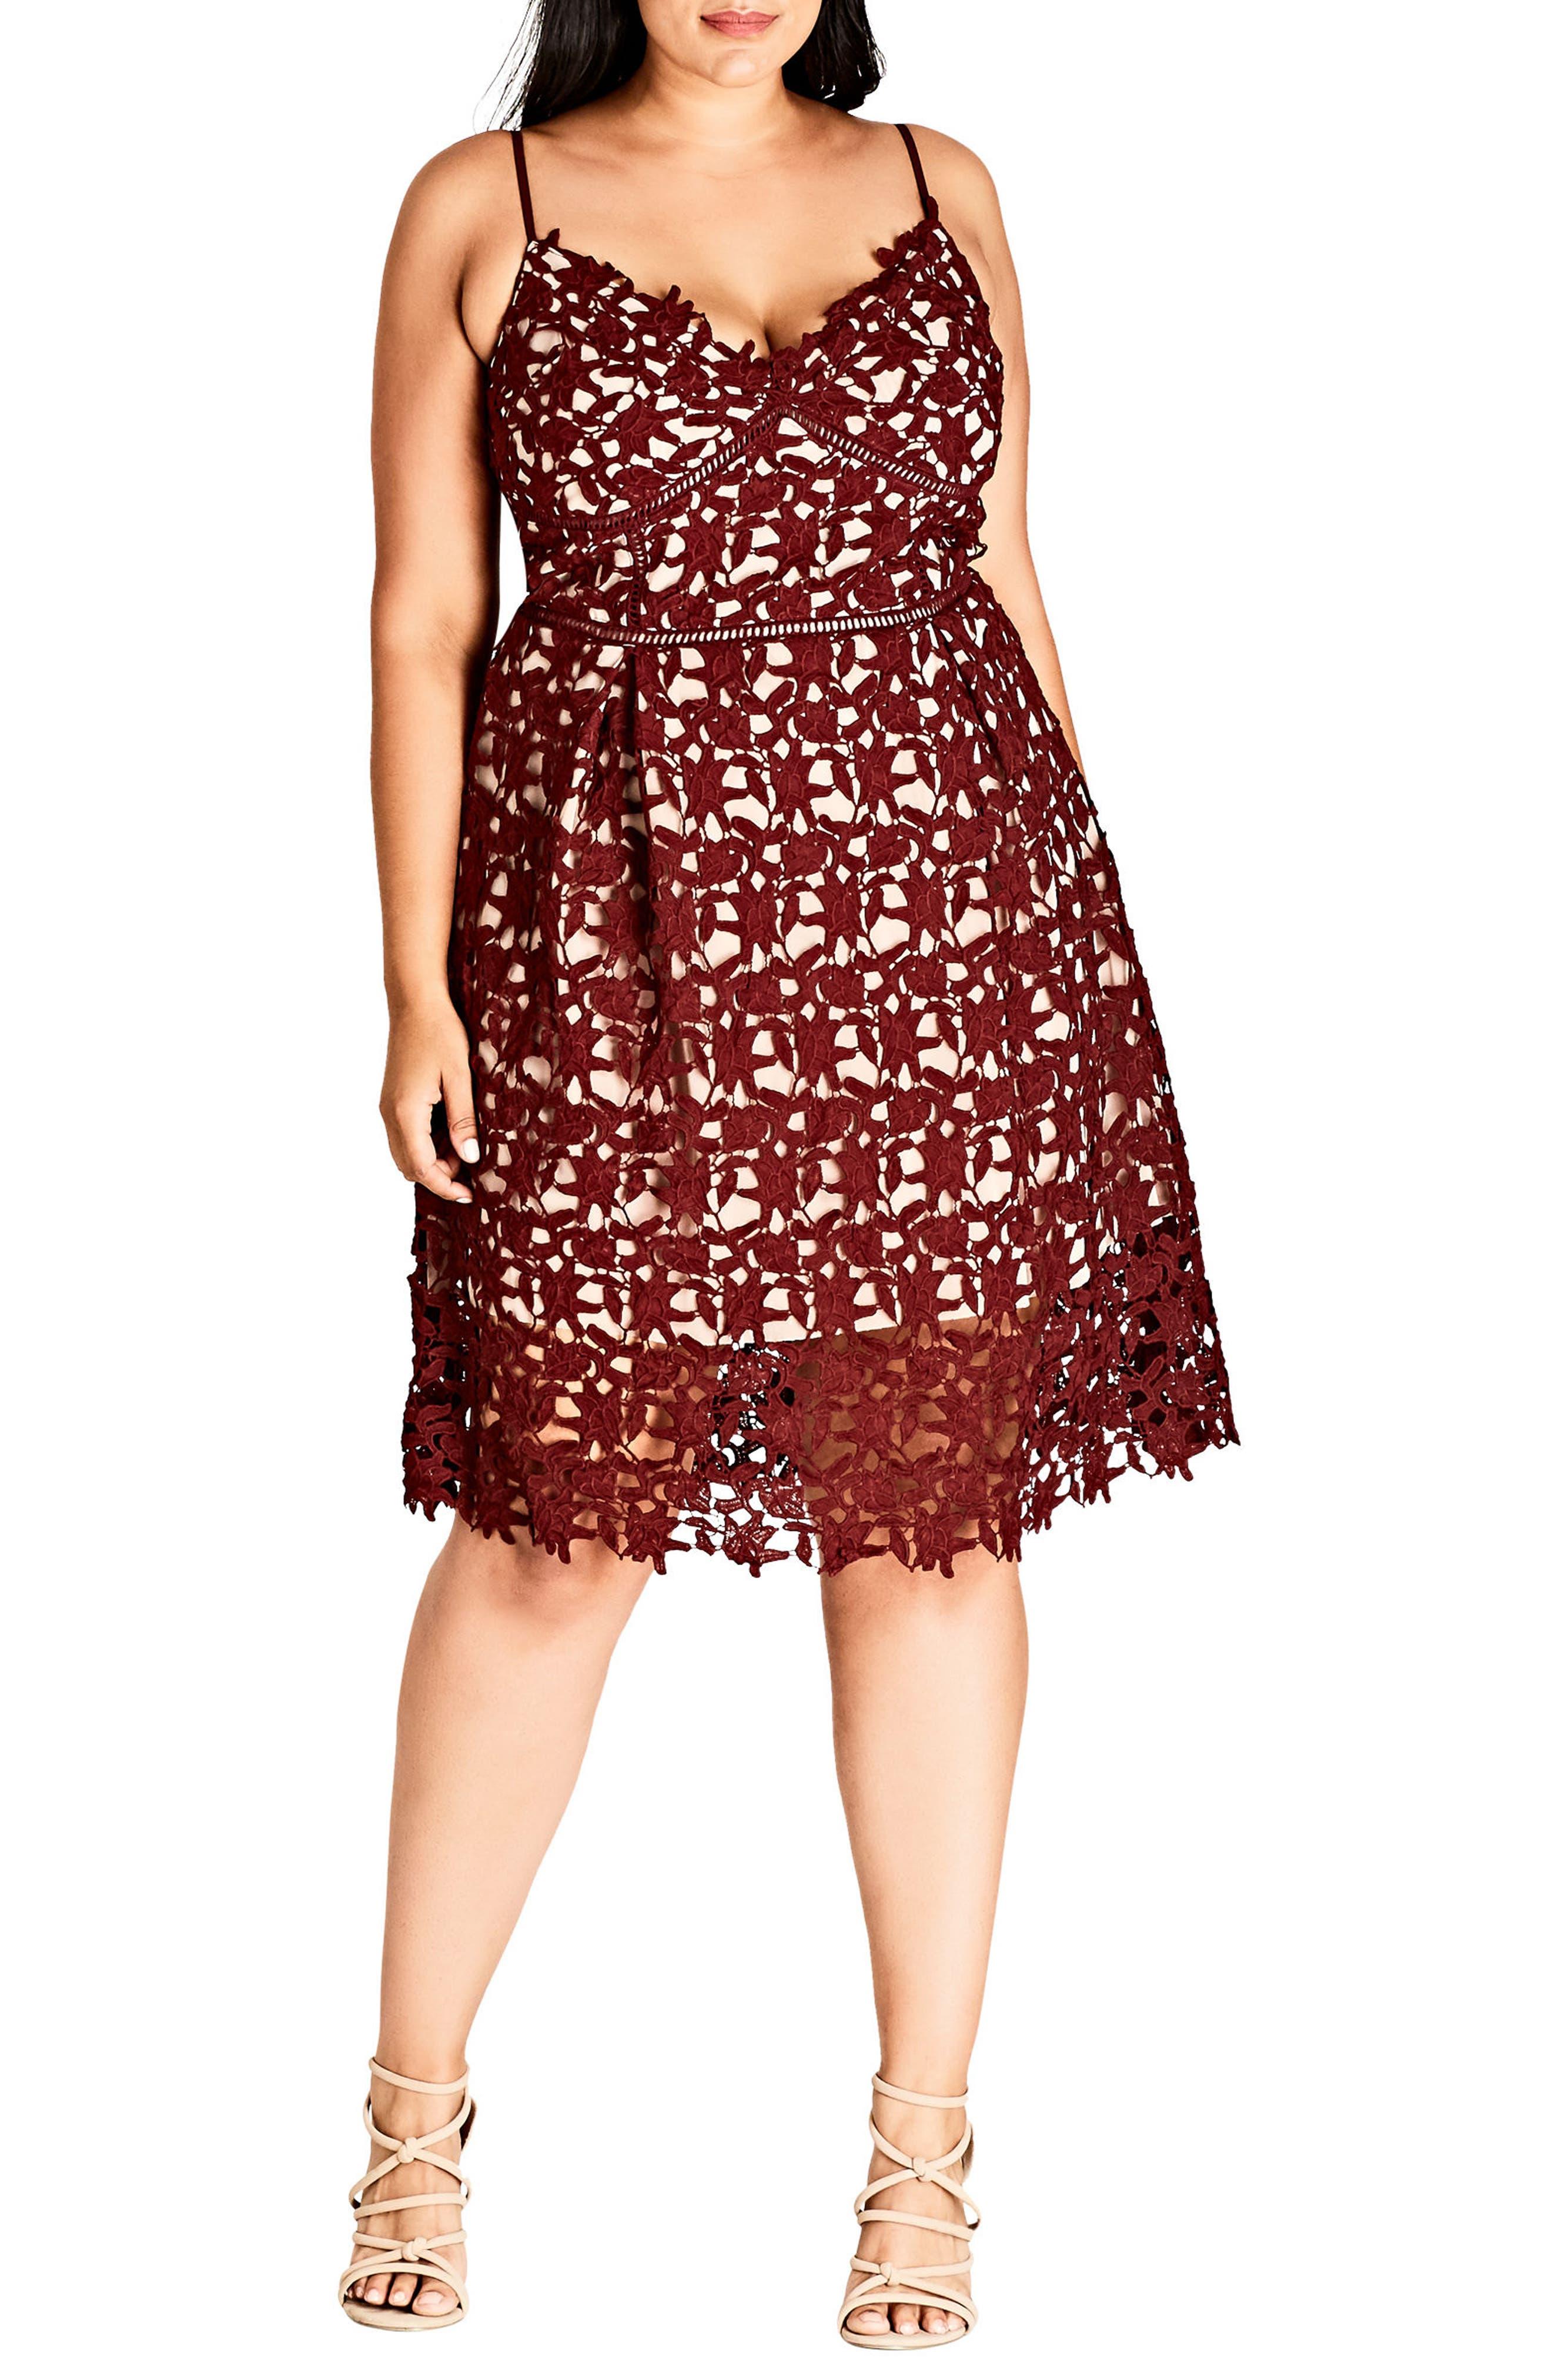 So Fancy Lace Dress,                             Main thumbnail 1, color,                             Ruby